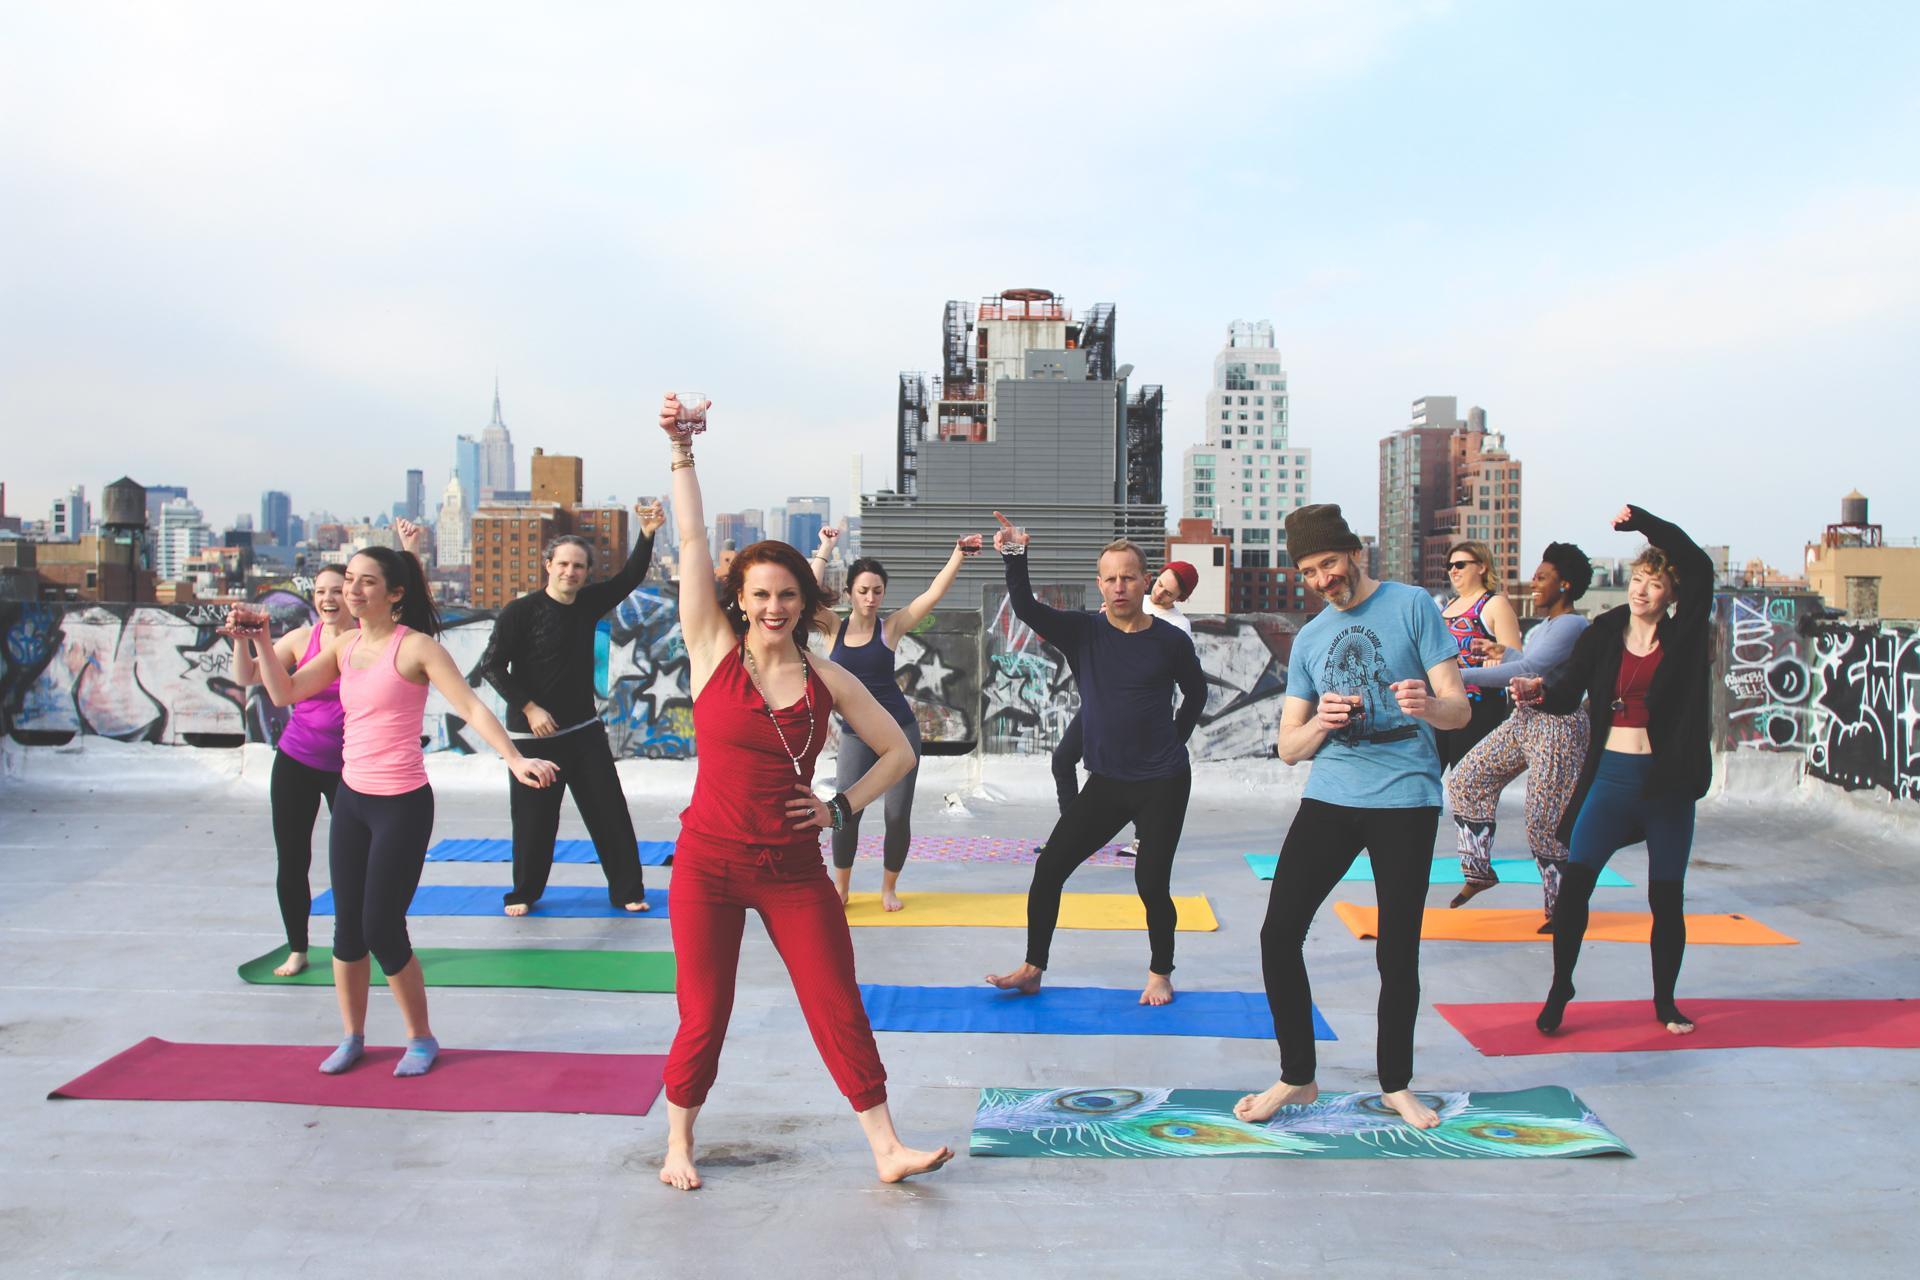 Drunk Yoga Nyc Presents Spirit S Yoga At Moxy Times Square 30 Jan 2020